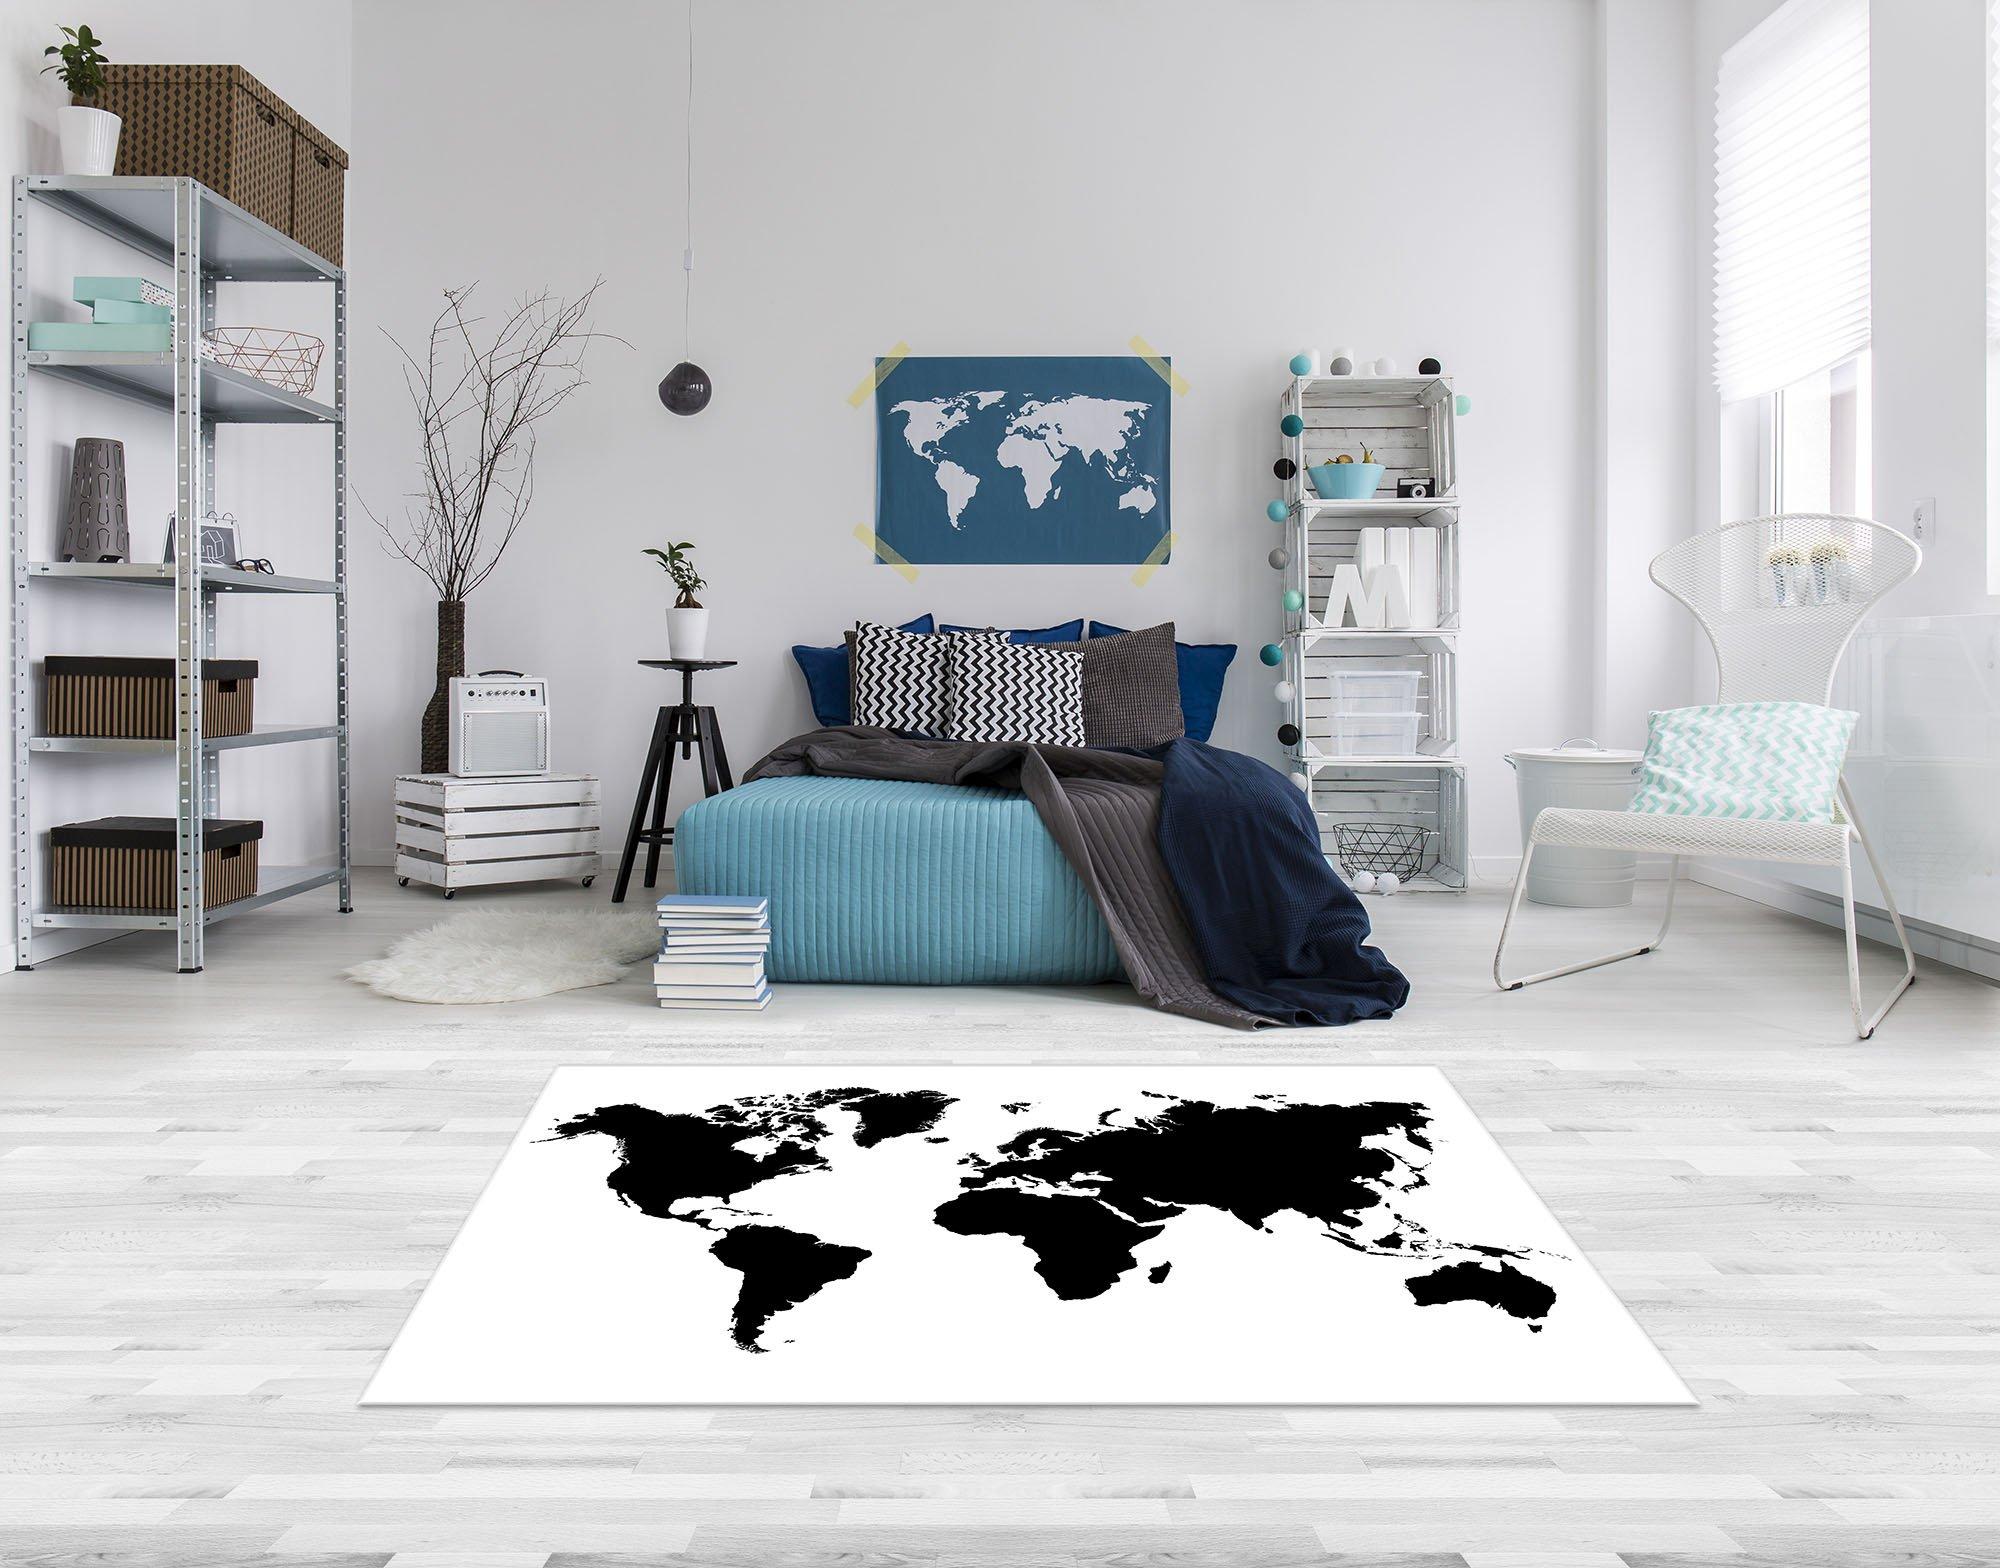 schwarz wei weltkarte forwall. Black Bedroom Furniture Sets. Home Design Ideas